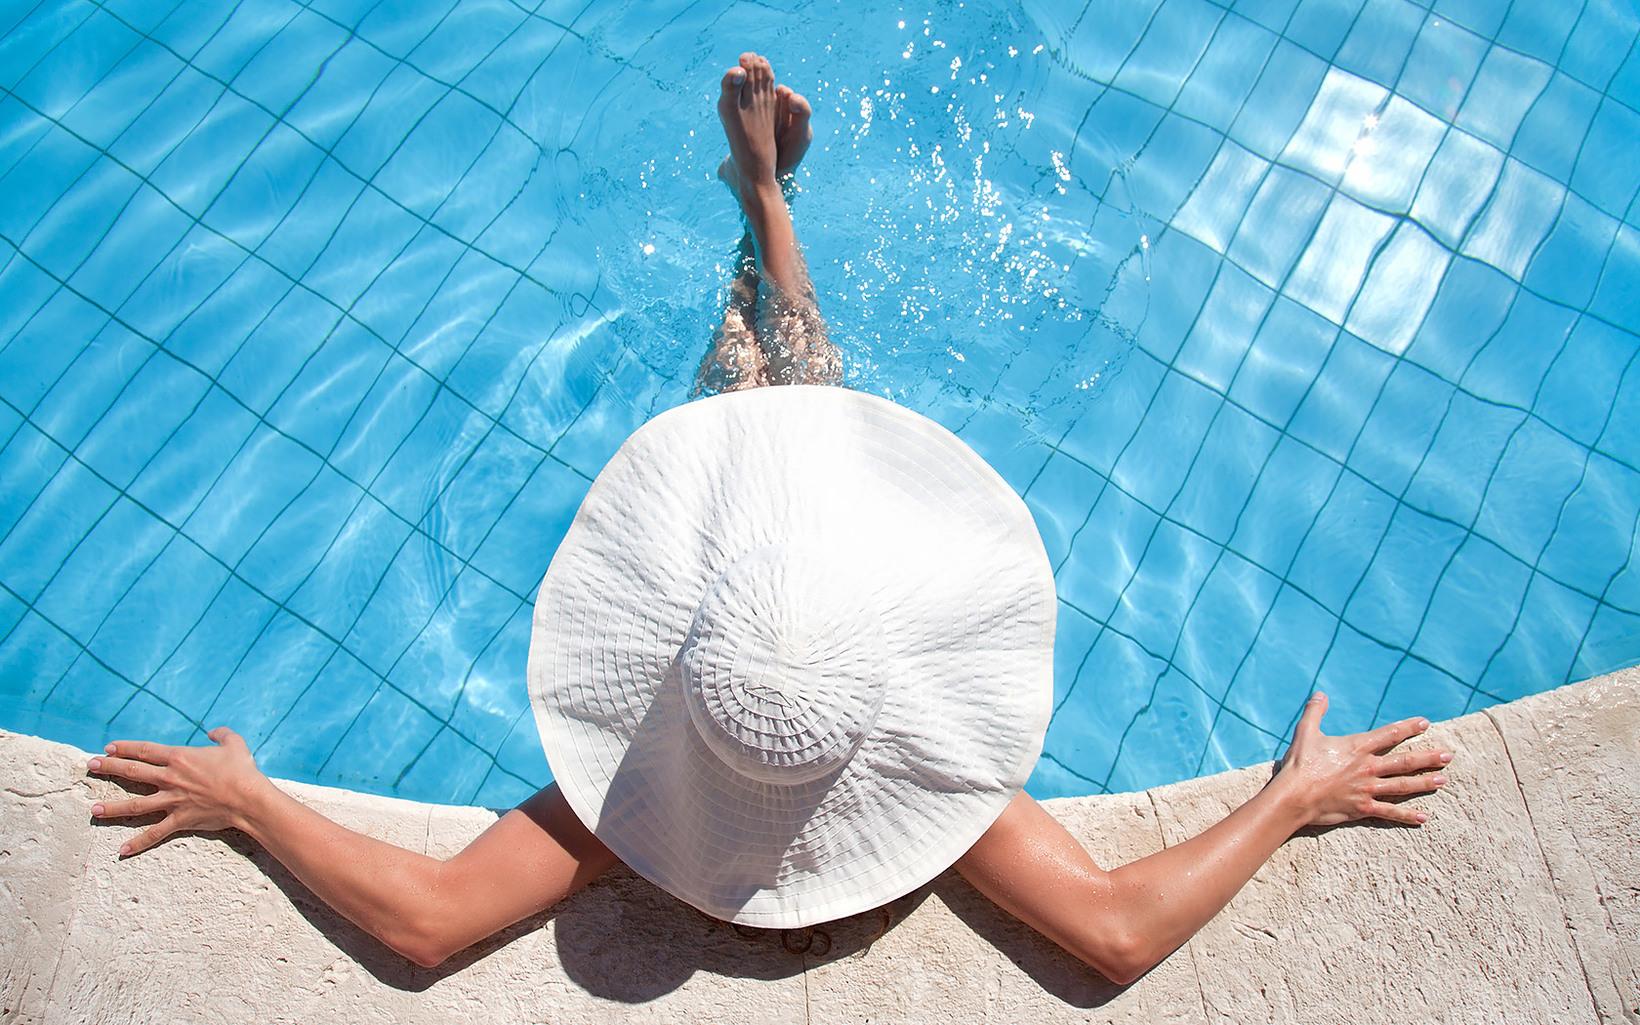 Bonaventure Resort and Spa joins CabanaPass